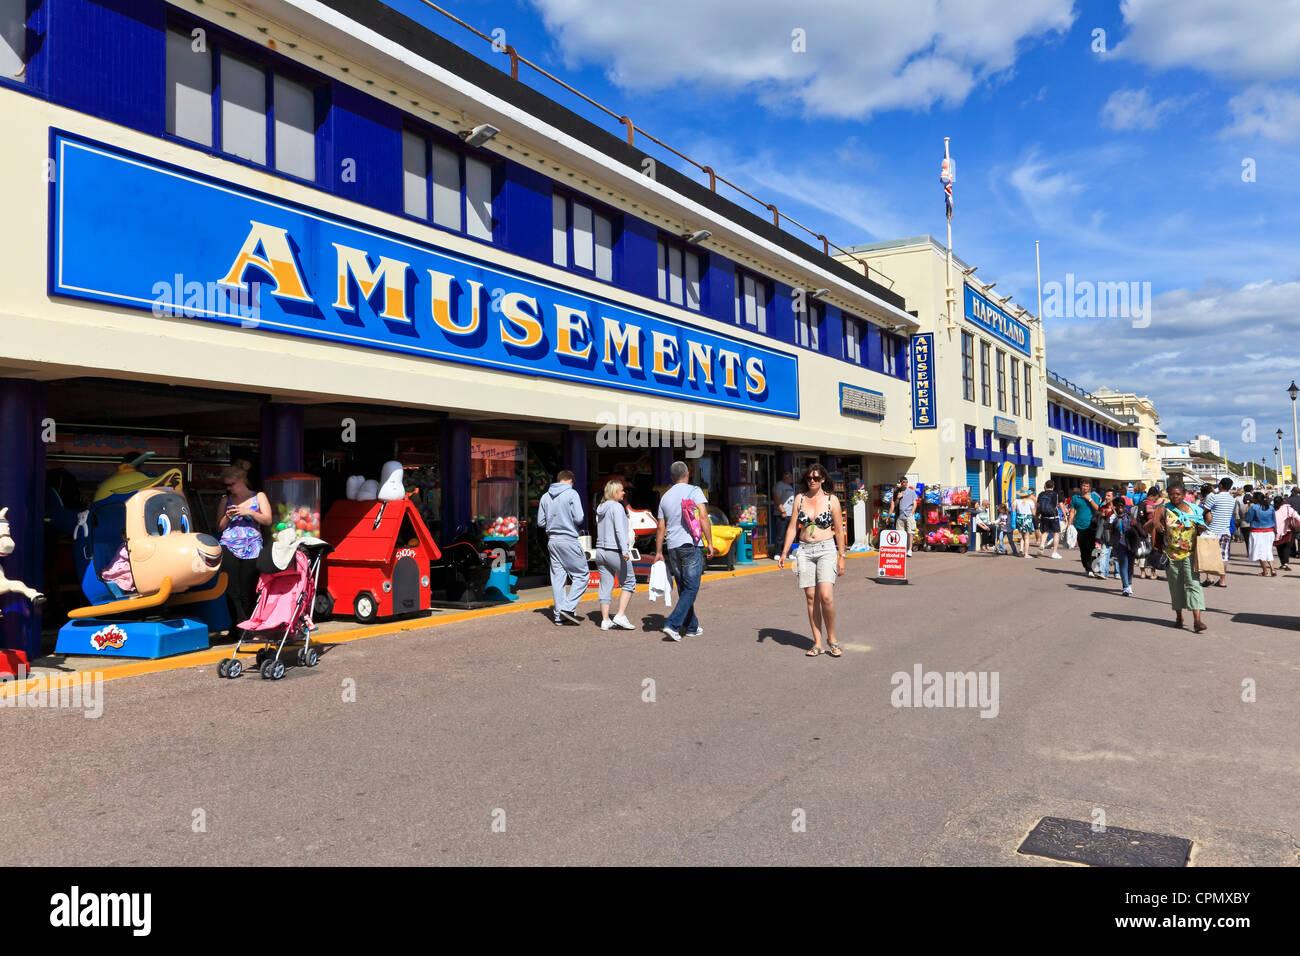 3962. Promenade Amusements, Bournemouth, Dorset, UK - Stock Image